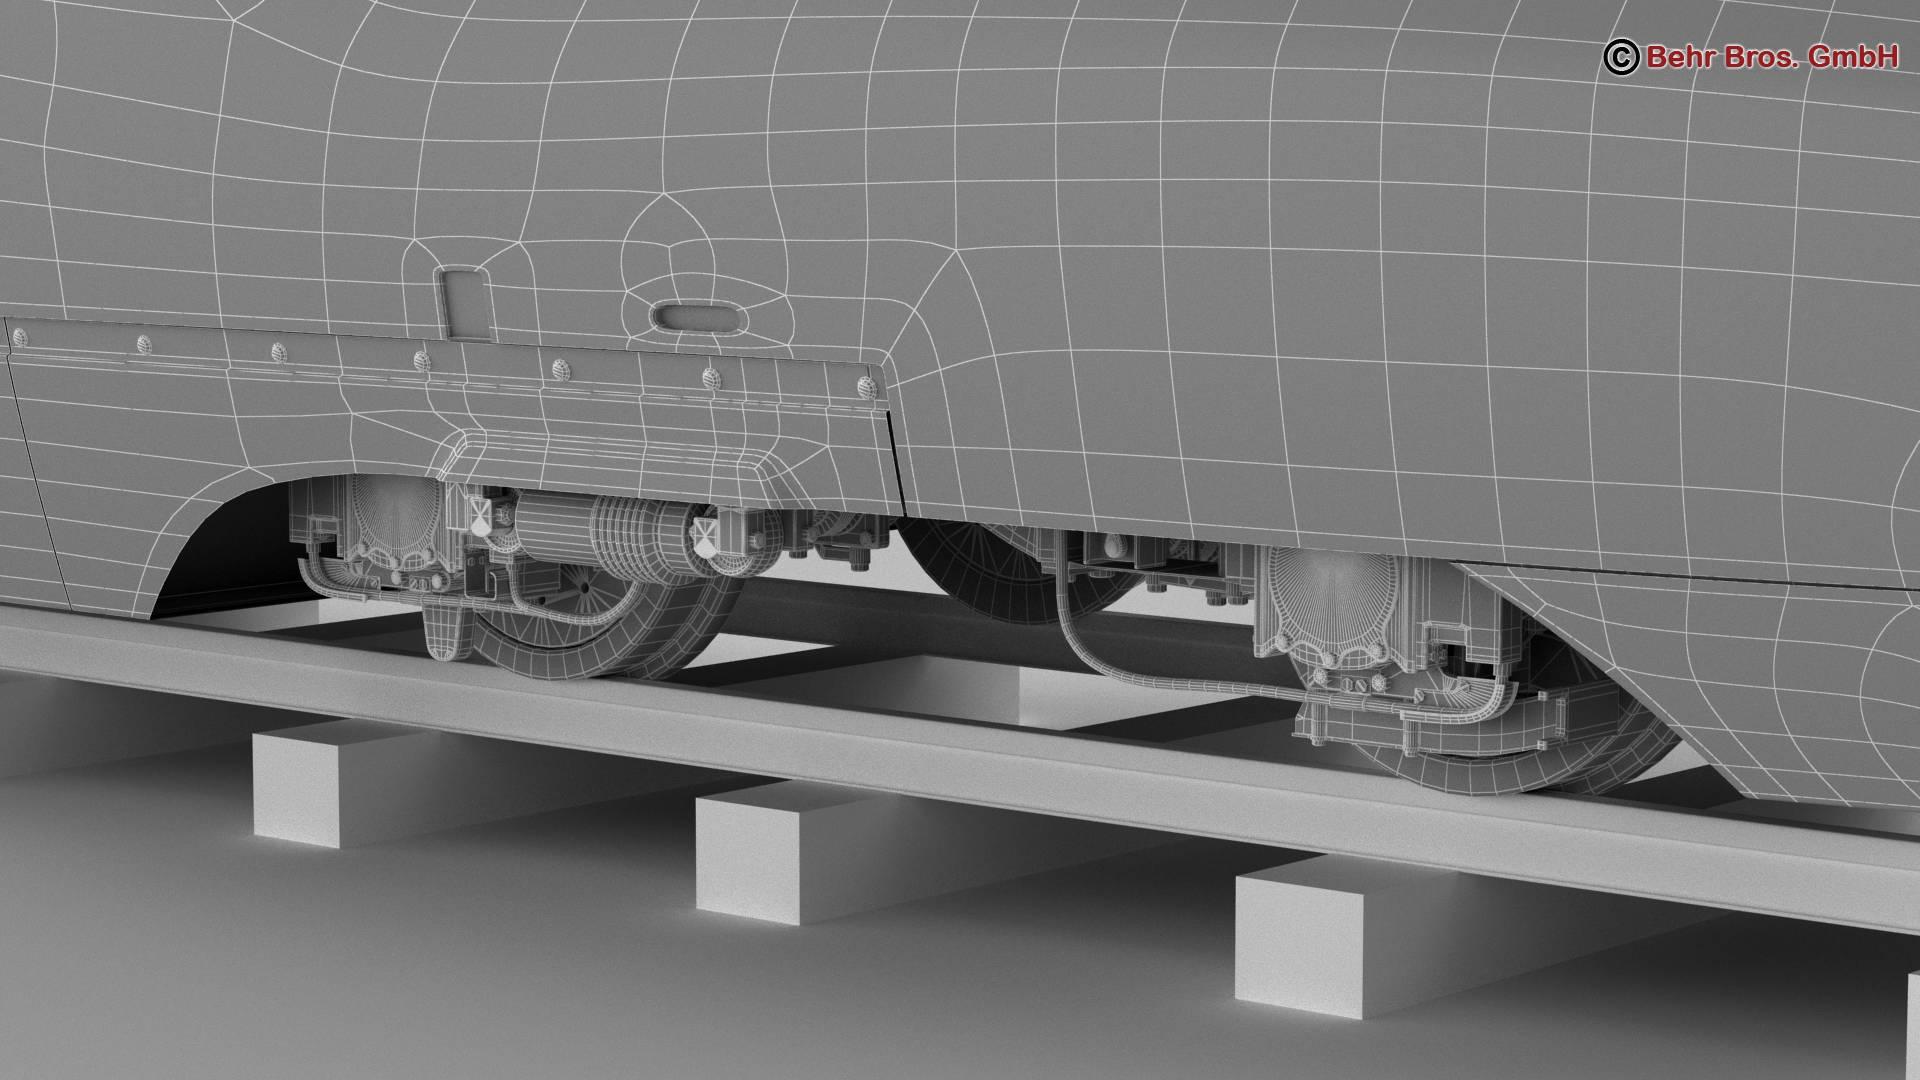 shinkansen e7 3d model 3ds max fbx c4d lwo ma mb obj 265669